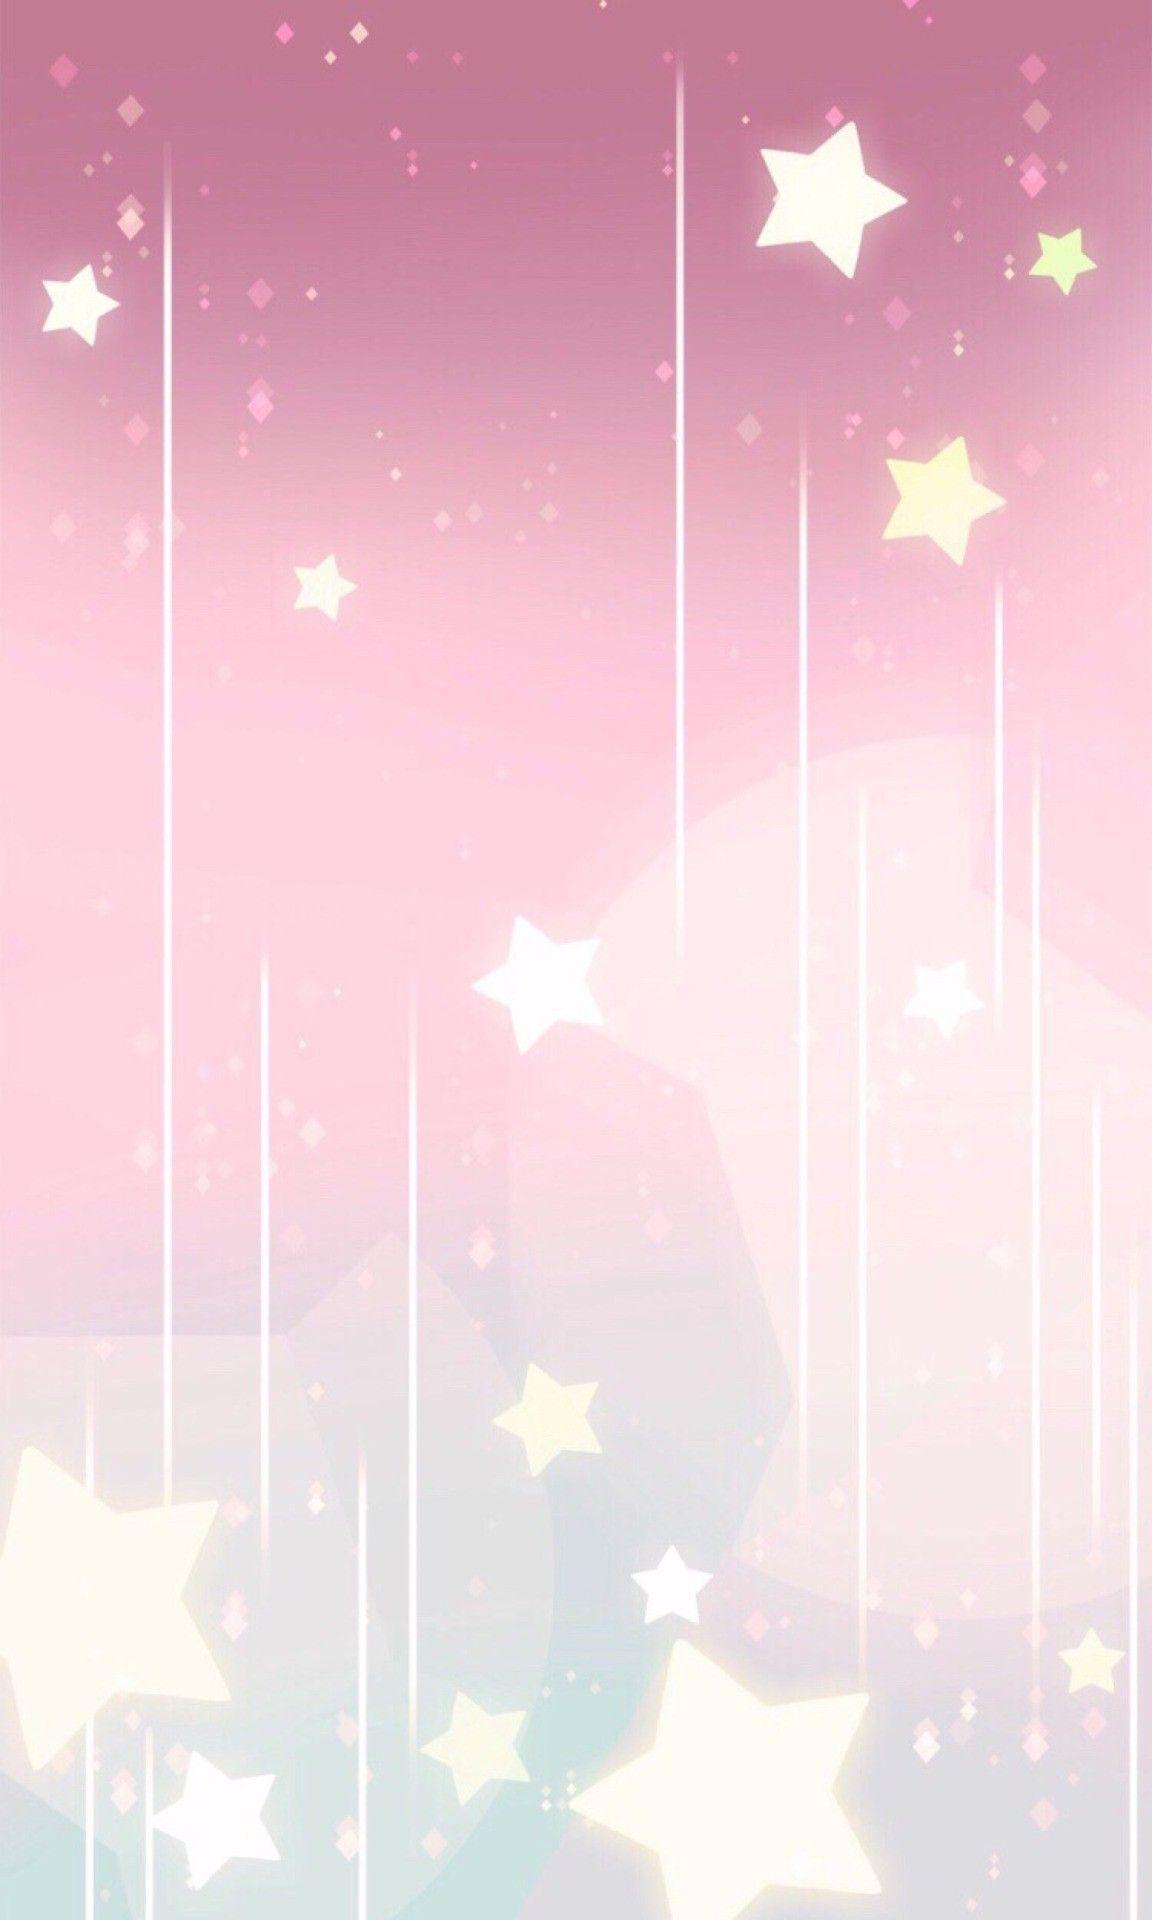 1152x1920 cartoon network pink backgrounds SU aesthetic phone 1152x1920